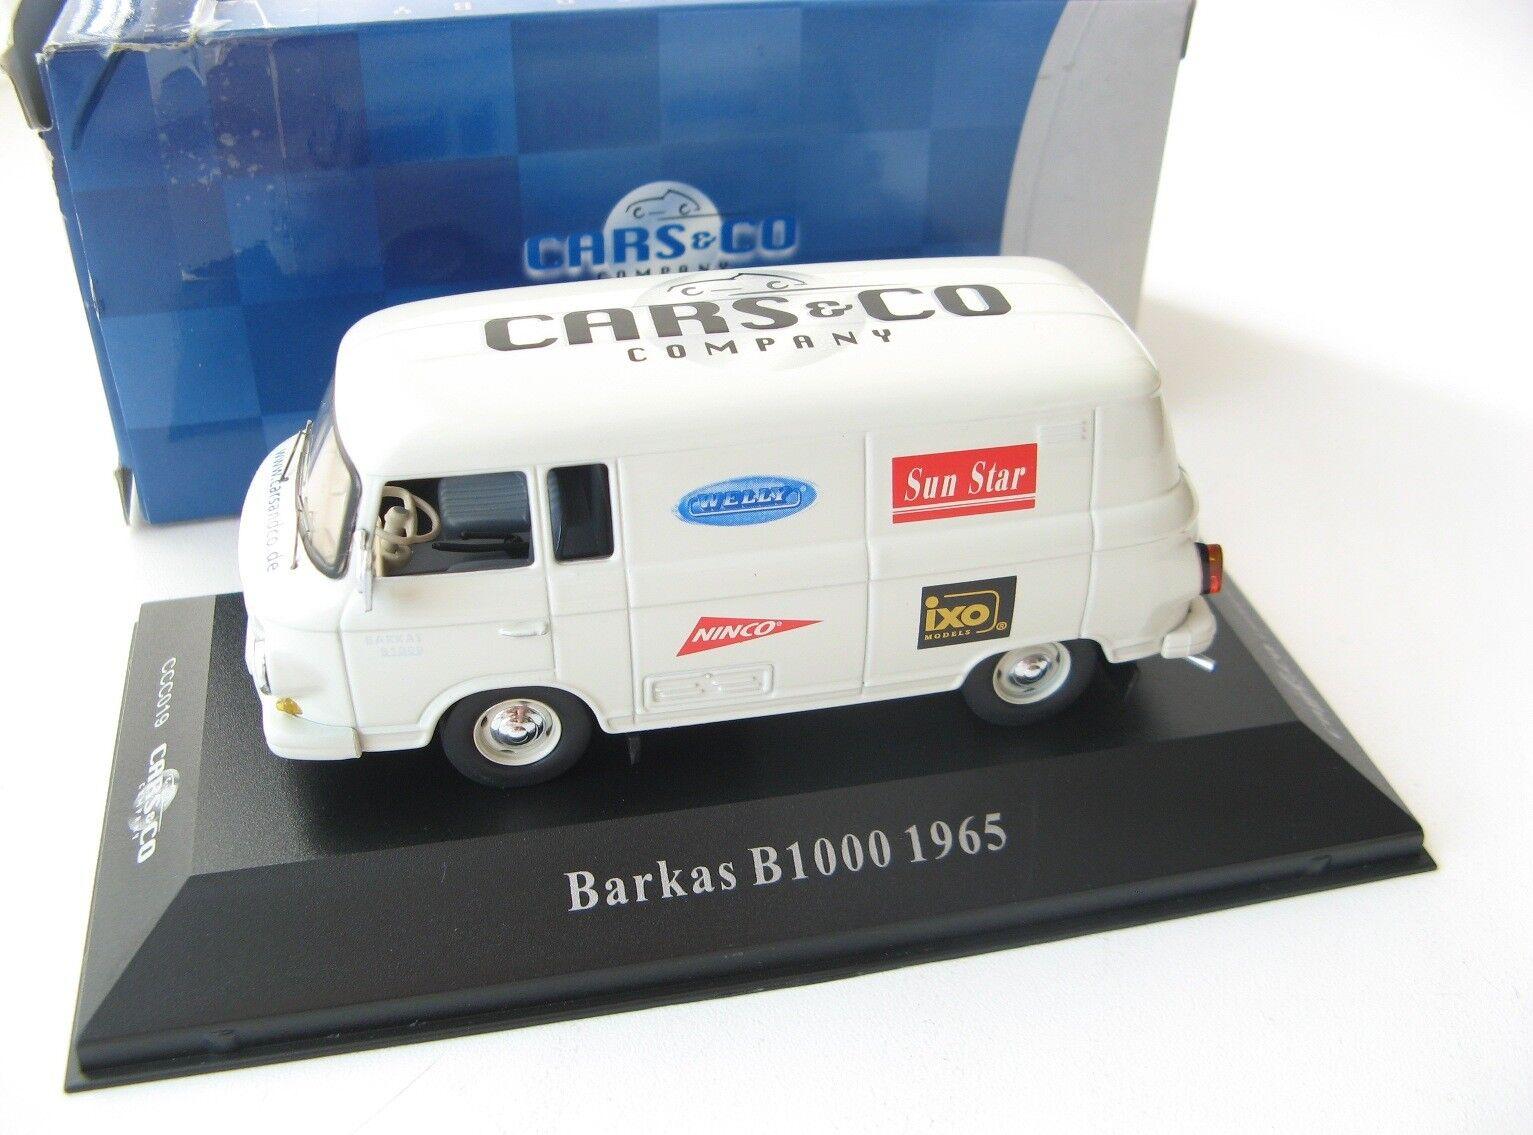 BARKAS B1000 van 1965 1 43 CARS&CO Lim. 350 pcs. RARE